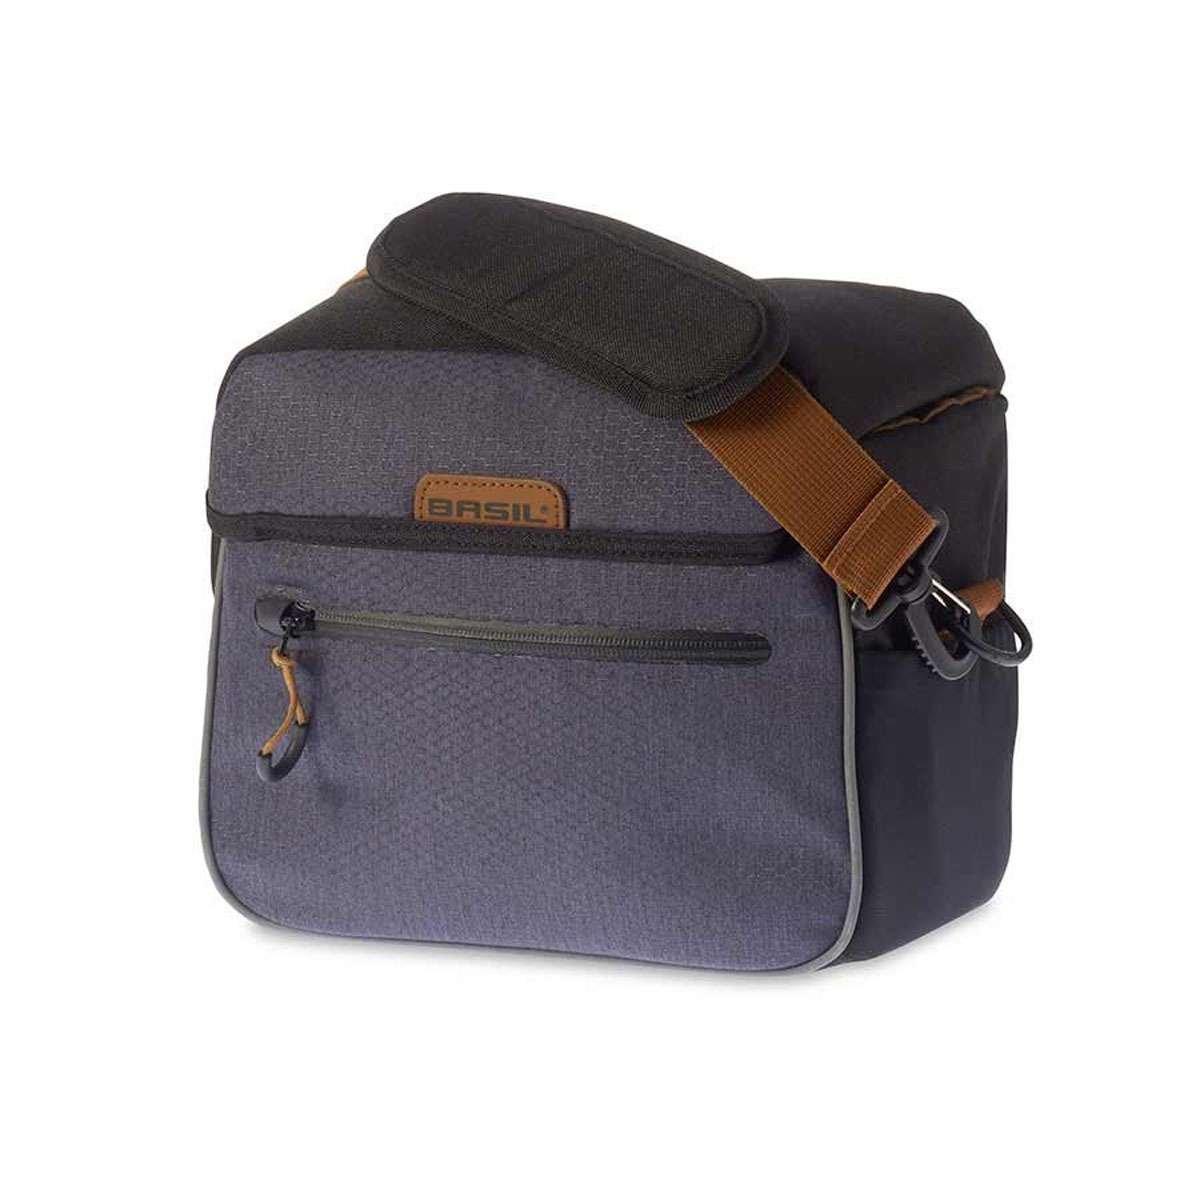 Basil 17667 Mile, Handlebar Bag, Black/Slate